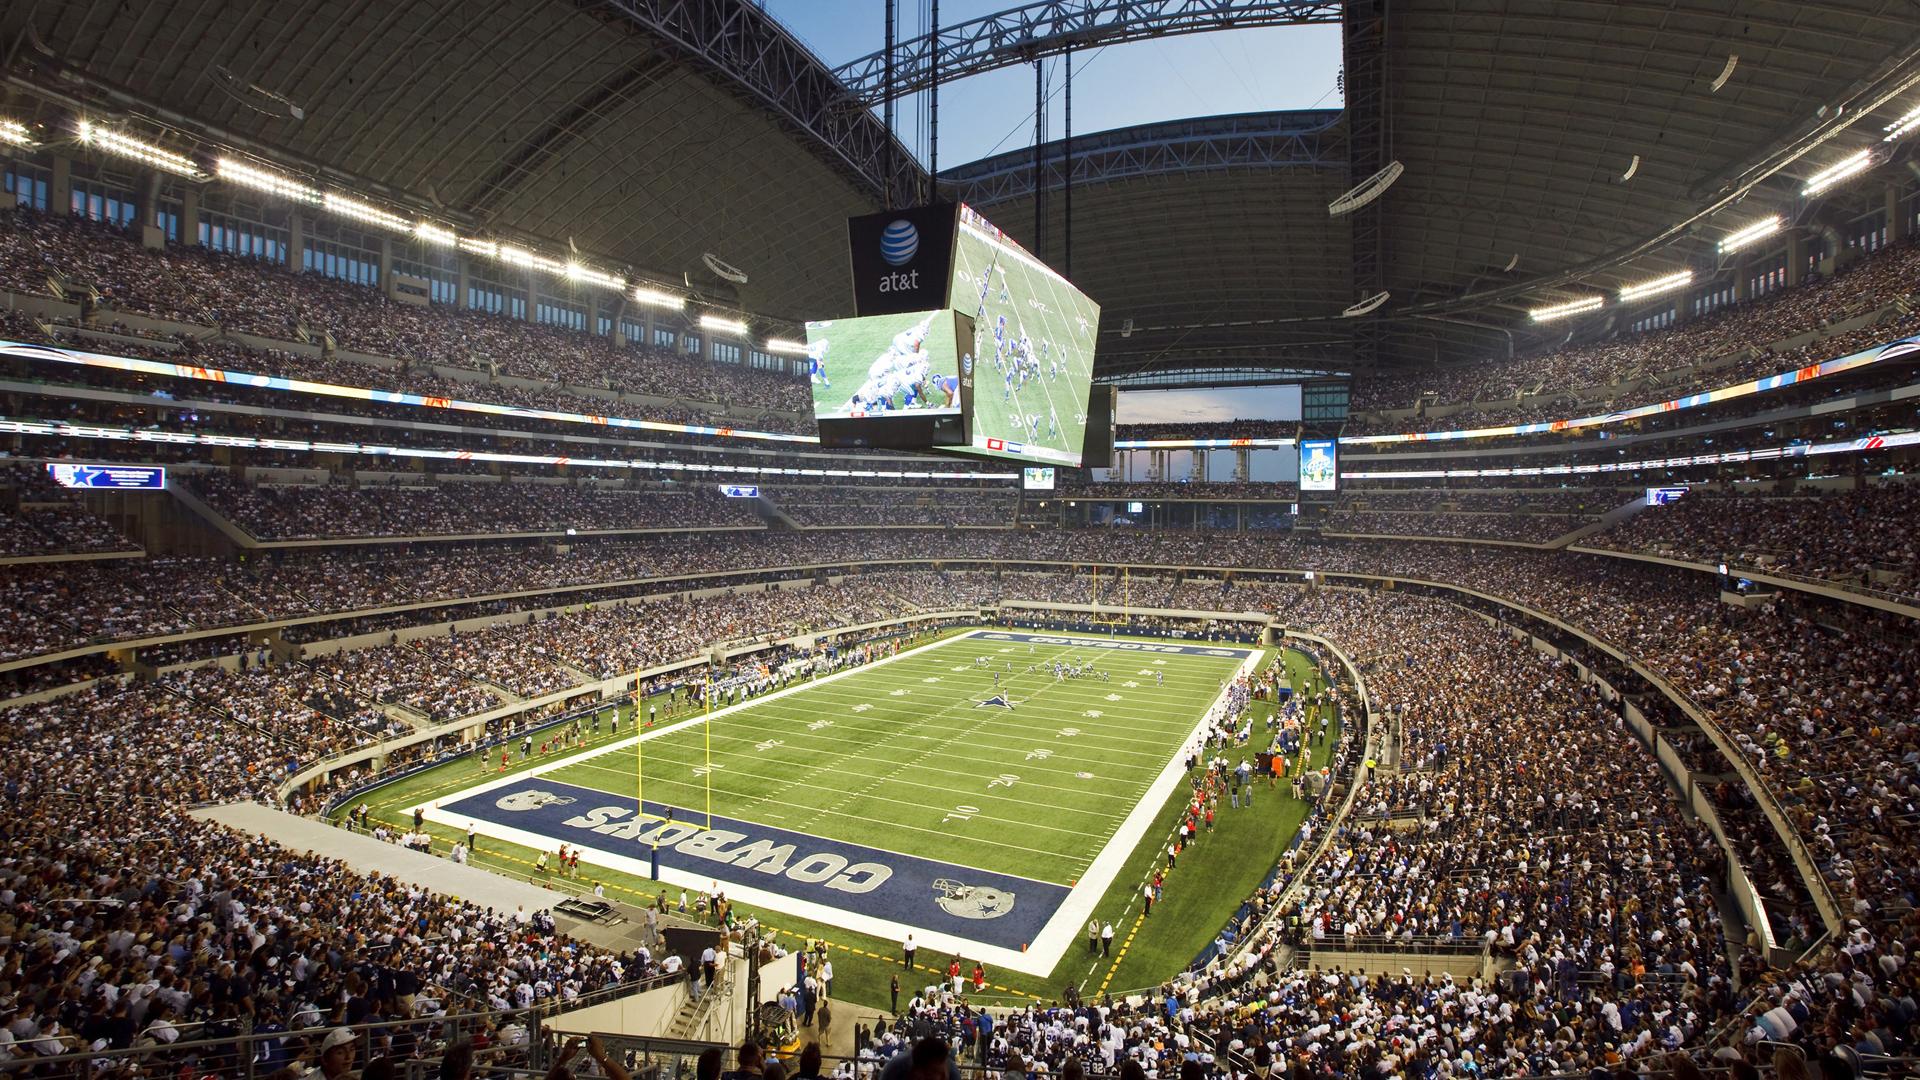 Nfl Dallas Cowboys Stadium During Game - Dallas Cowboys - HD Wallpaper